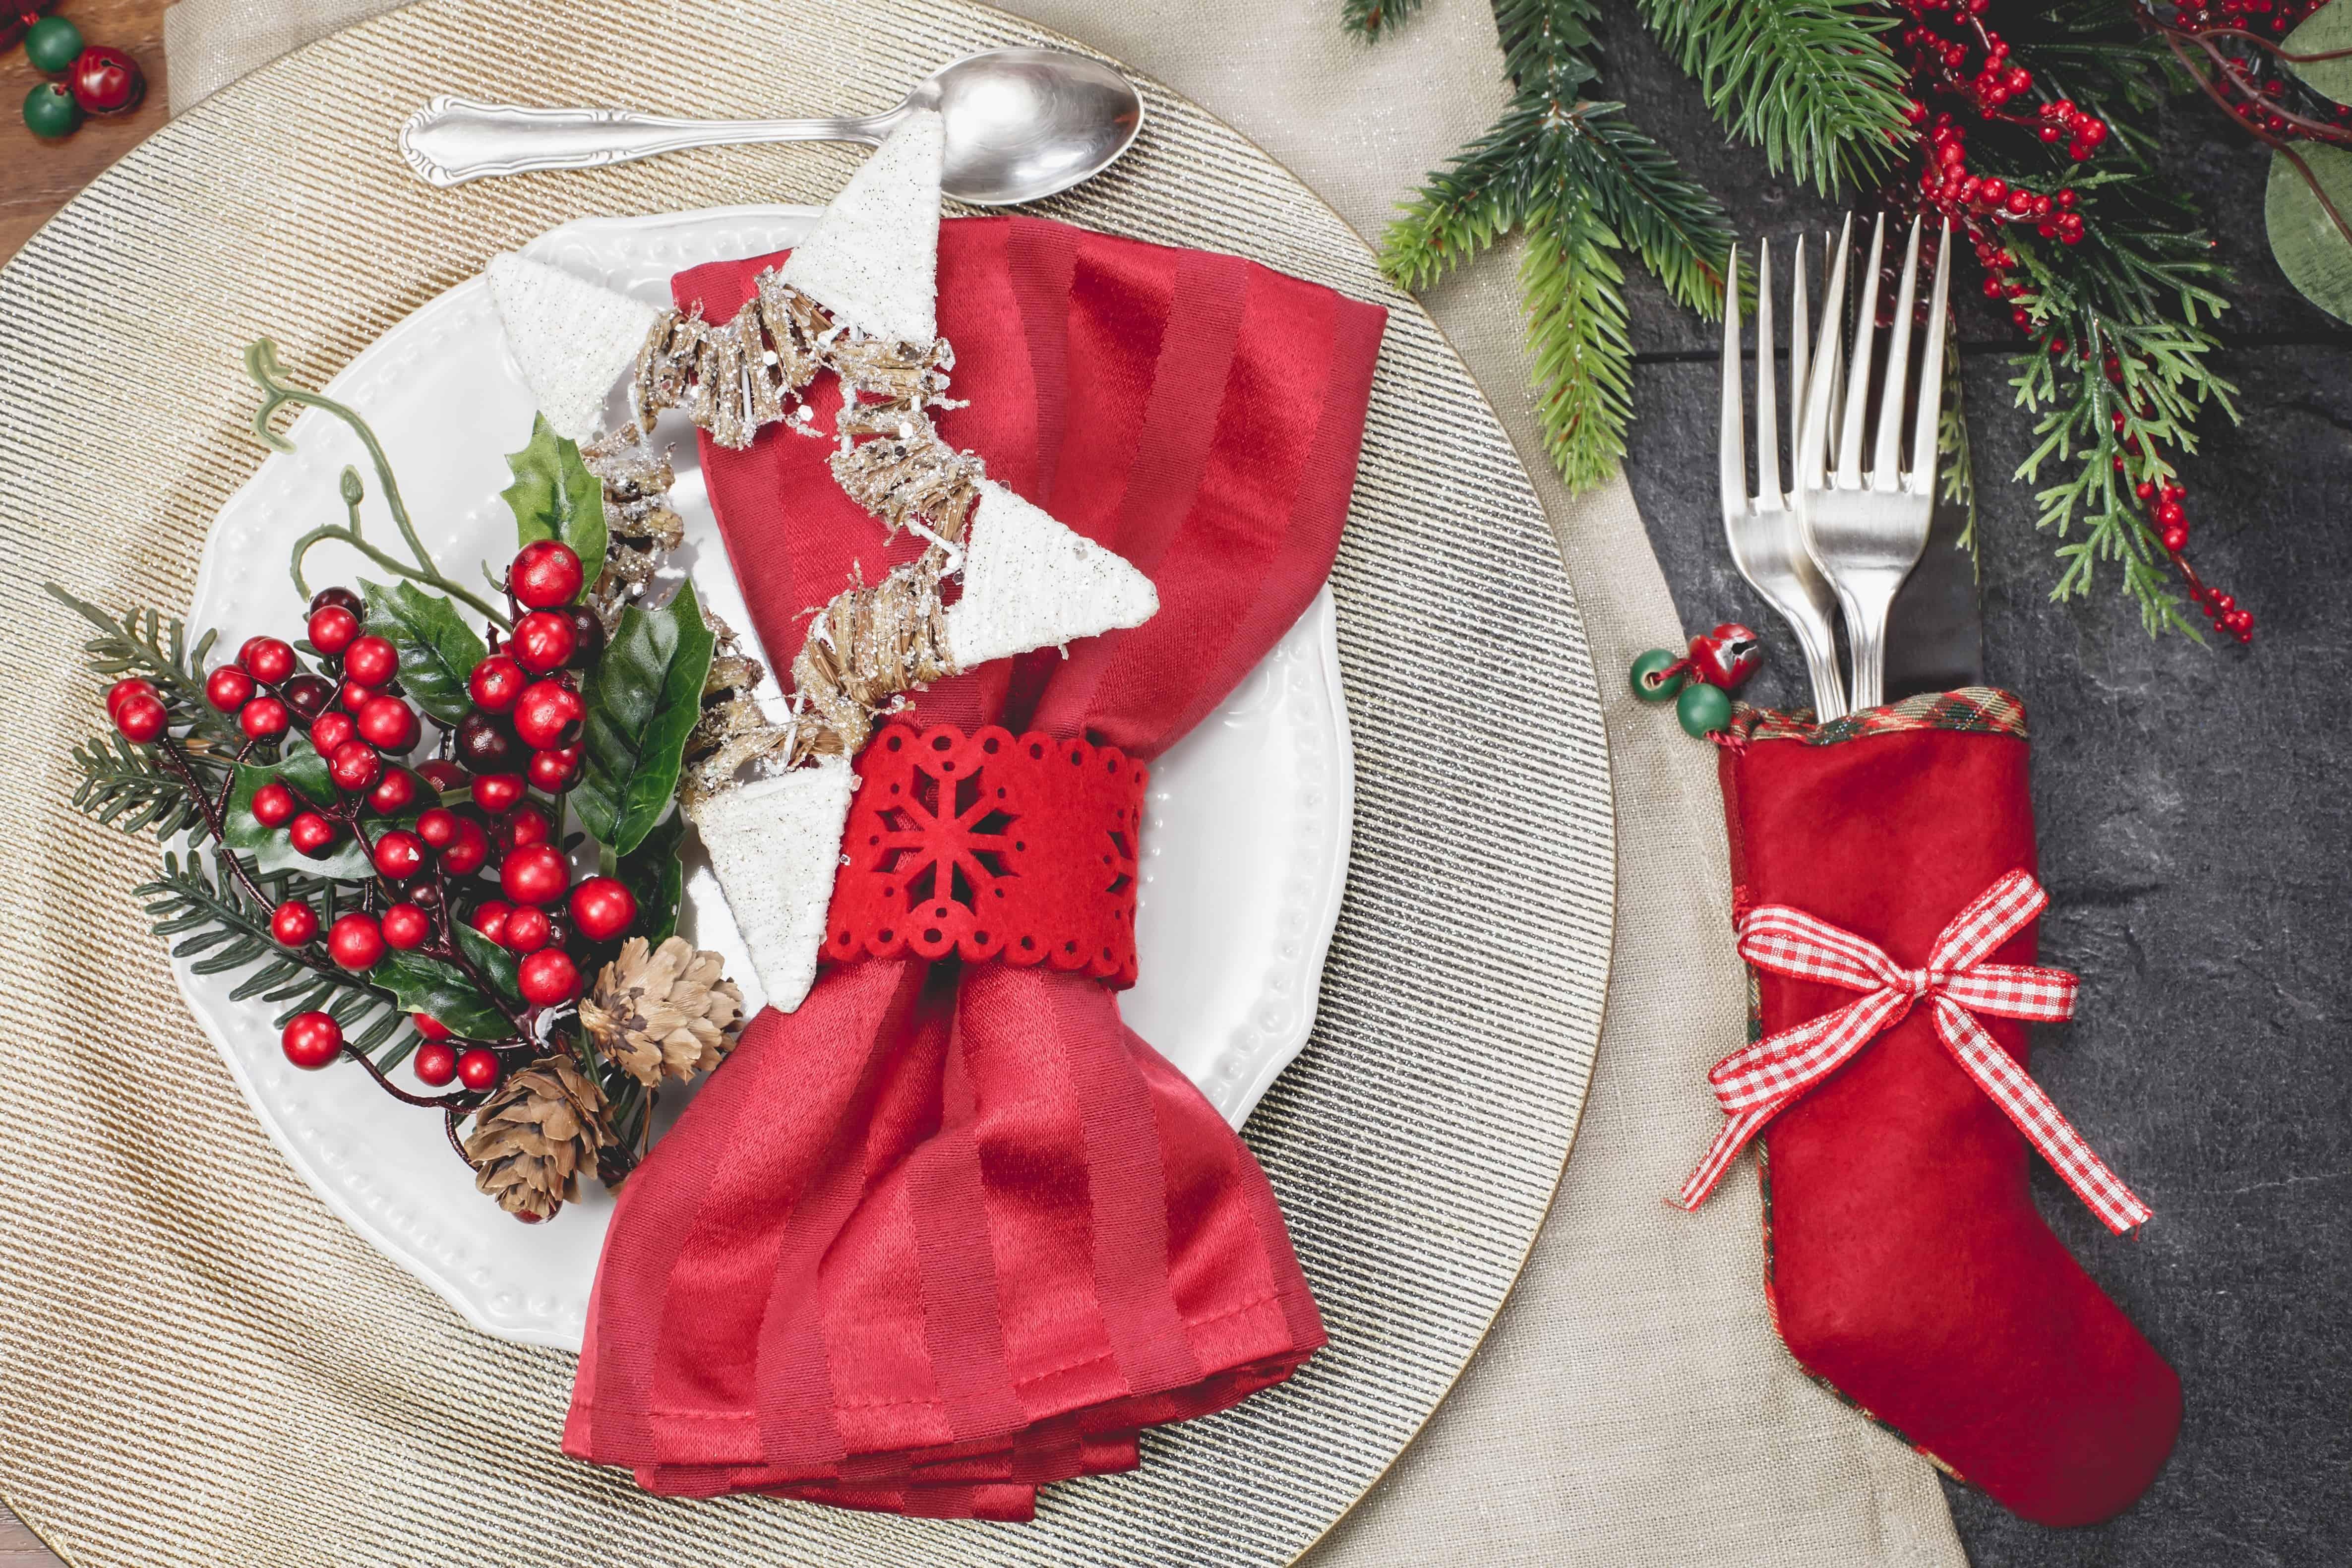 Healthy christmas menu